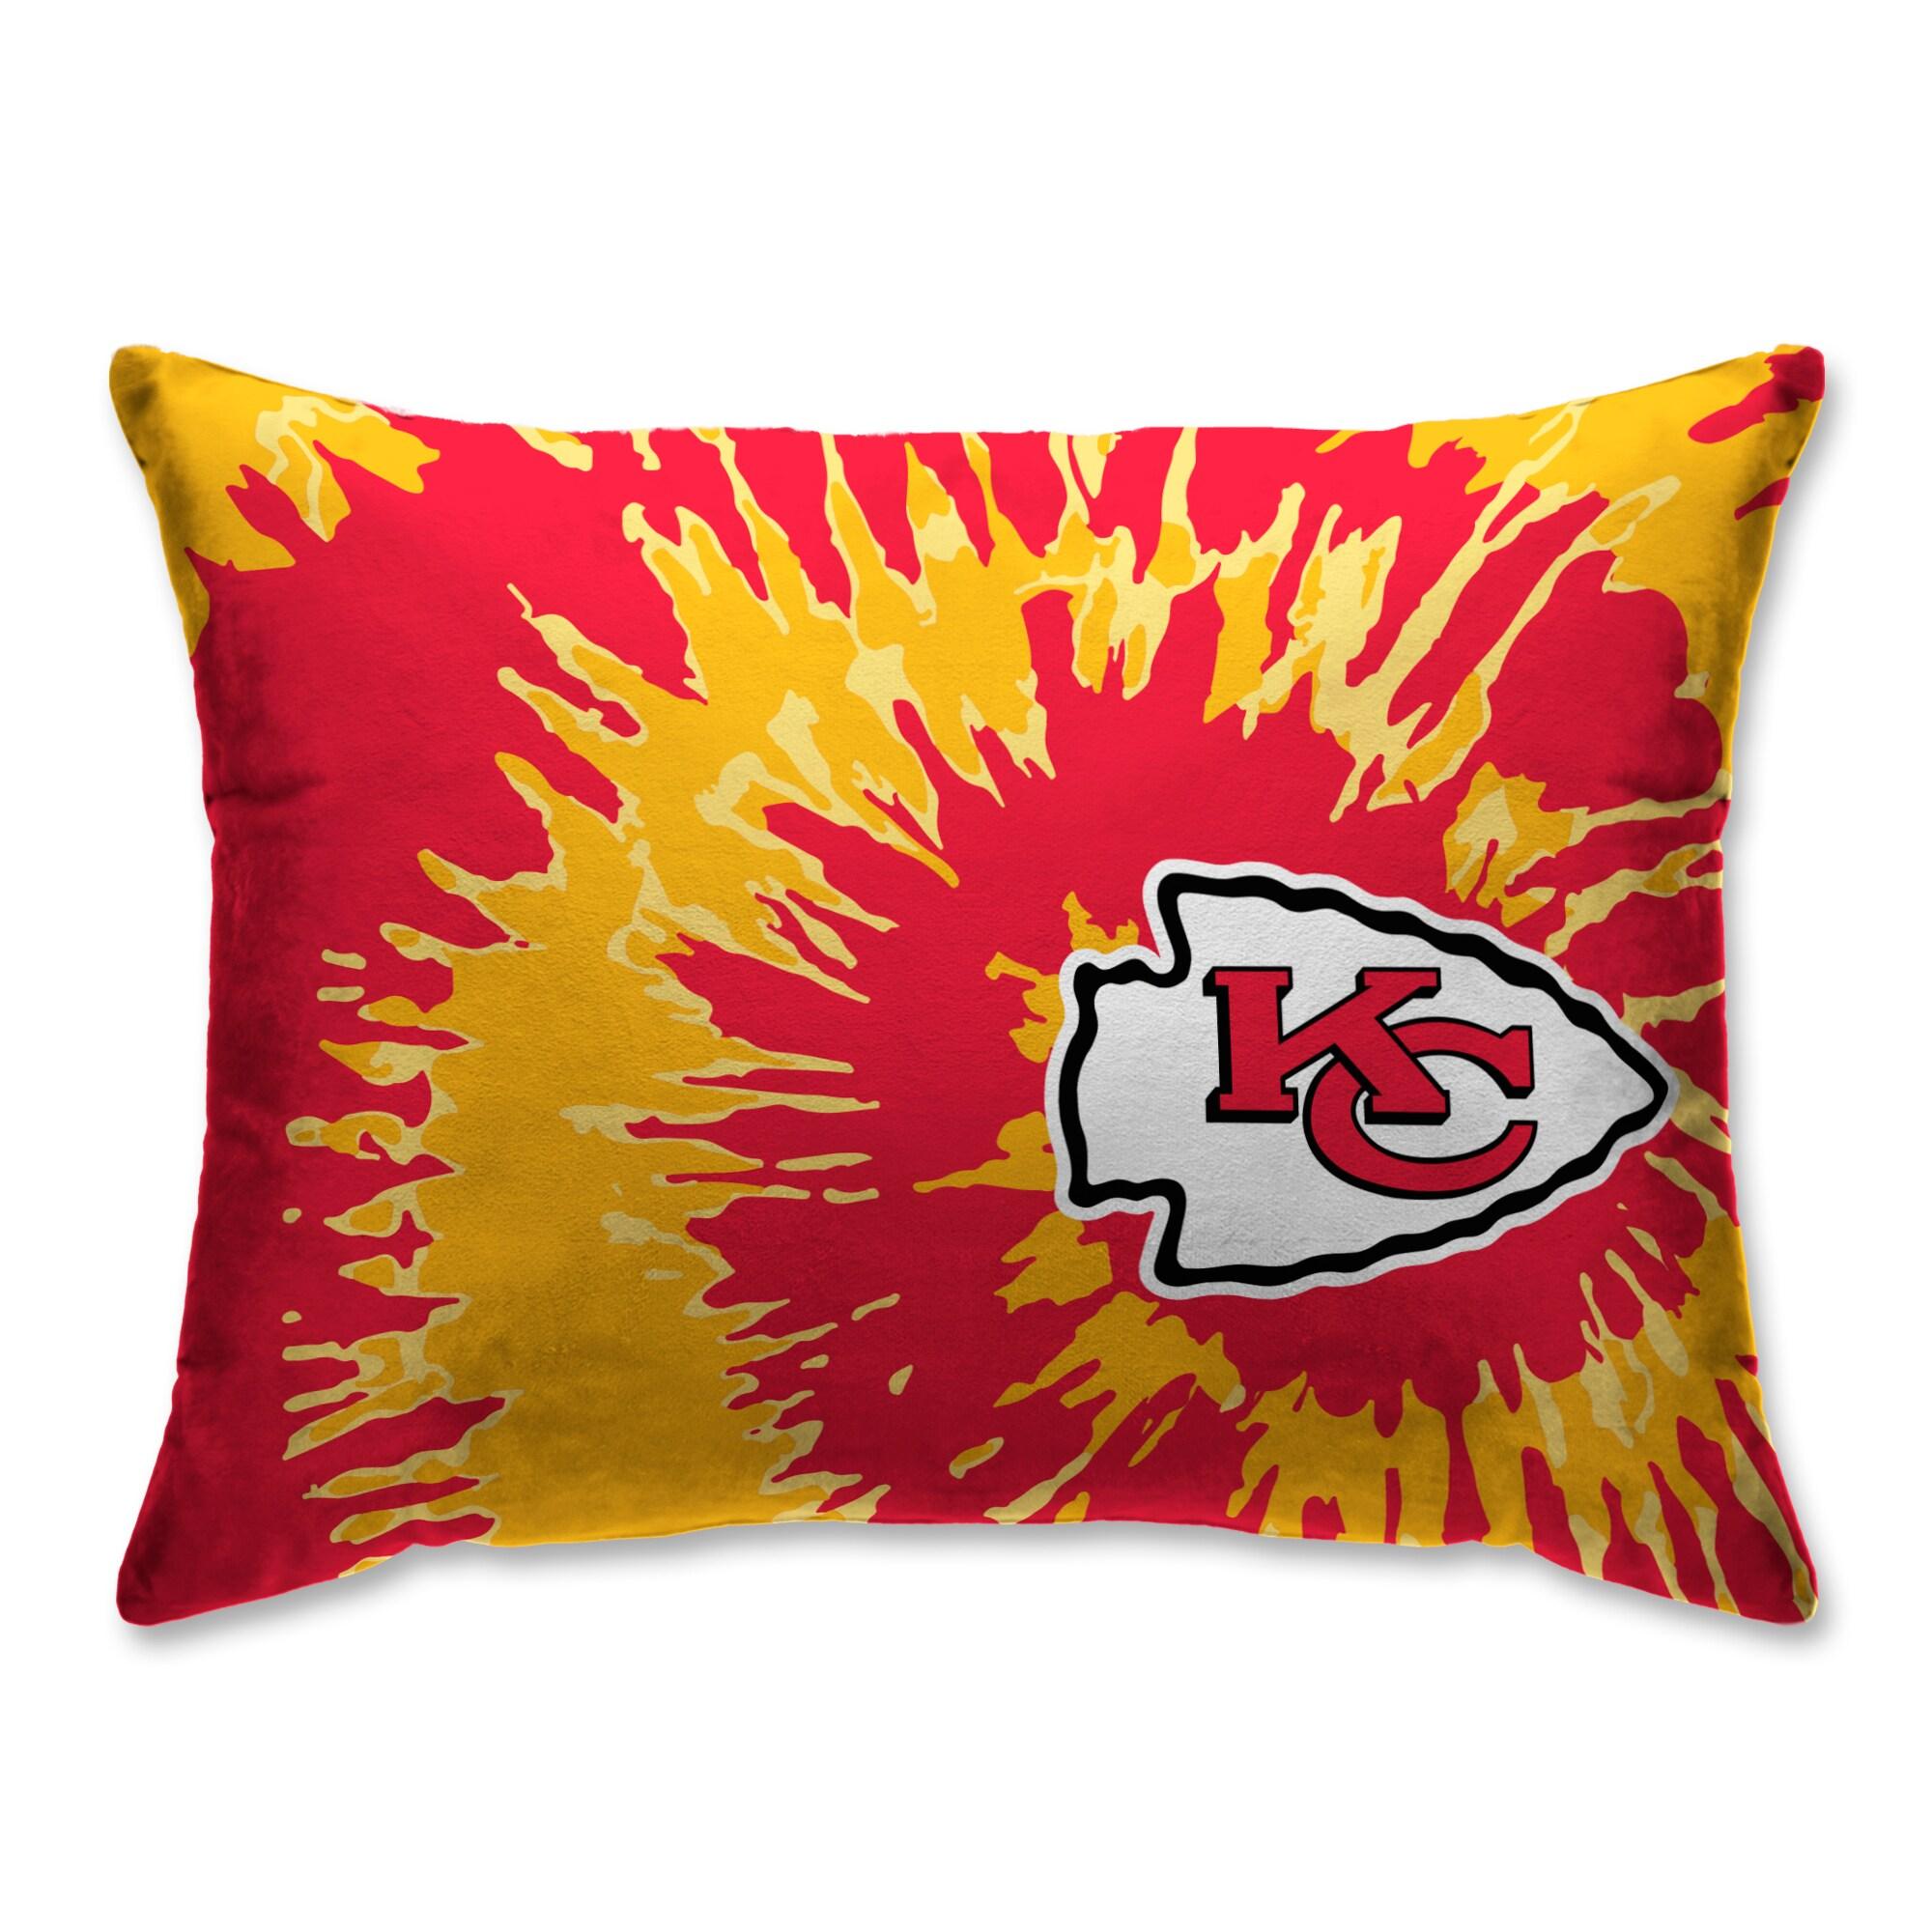 Kansas City Chiefs Tie Dye Plush Bed Pillow - Red